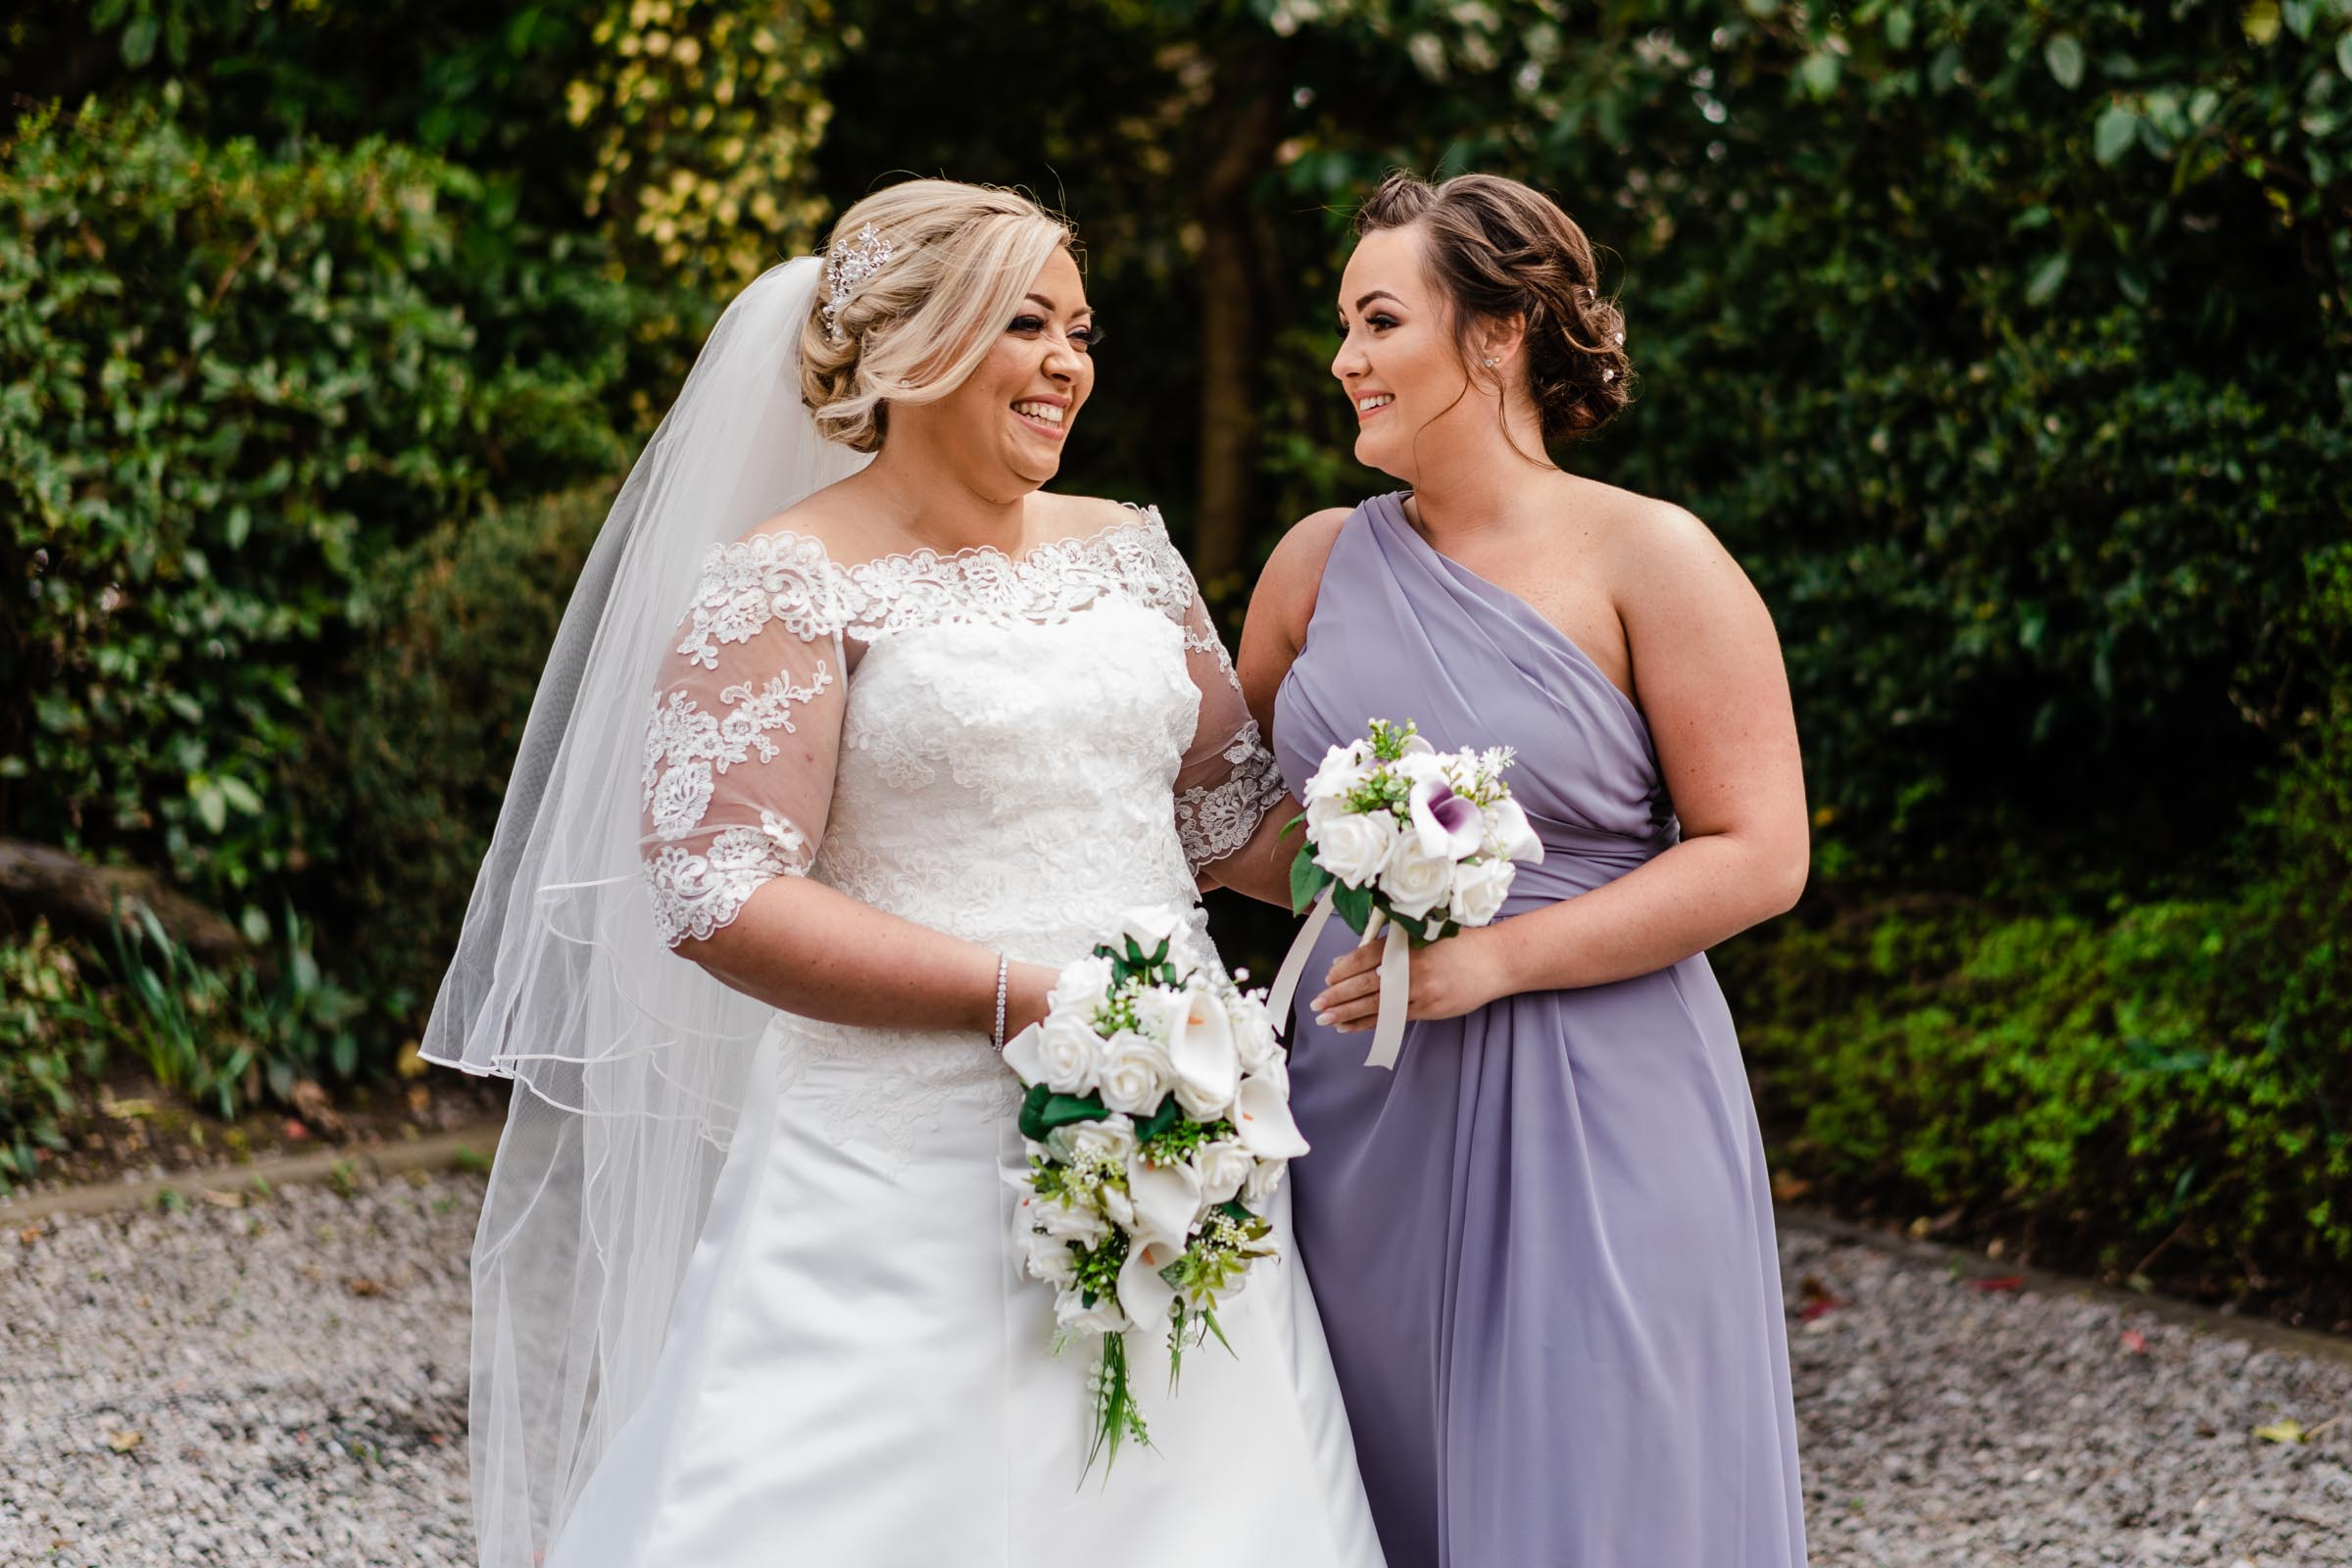 motherwell-moorings-wedding-photographer-dearlyphotography (46 of 77).jpg